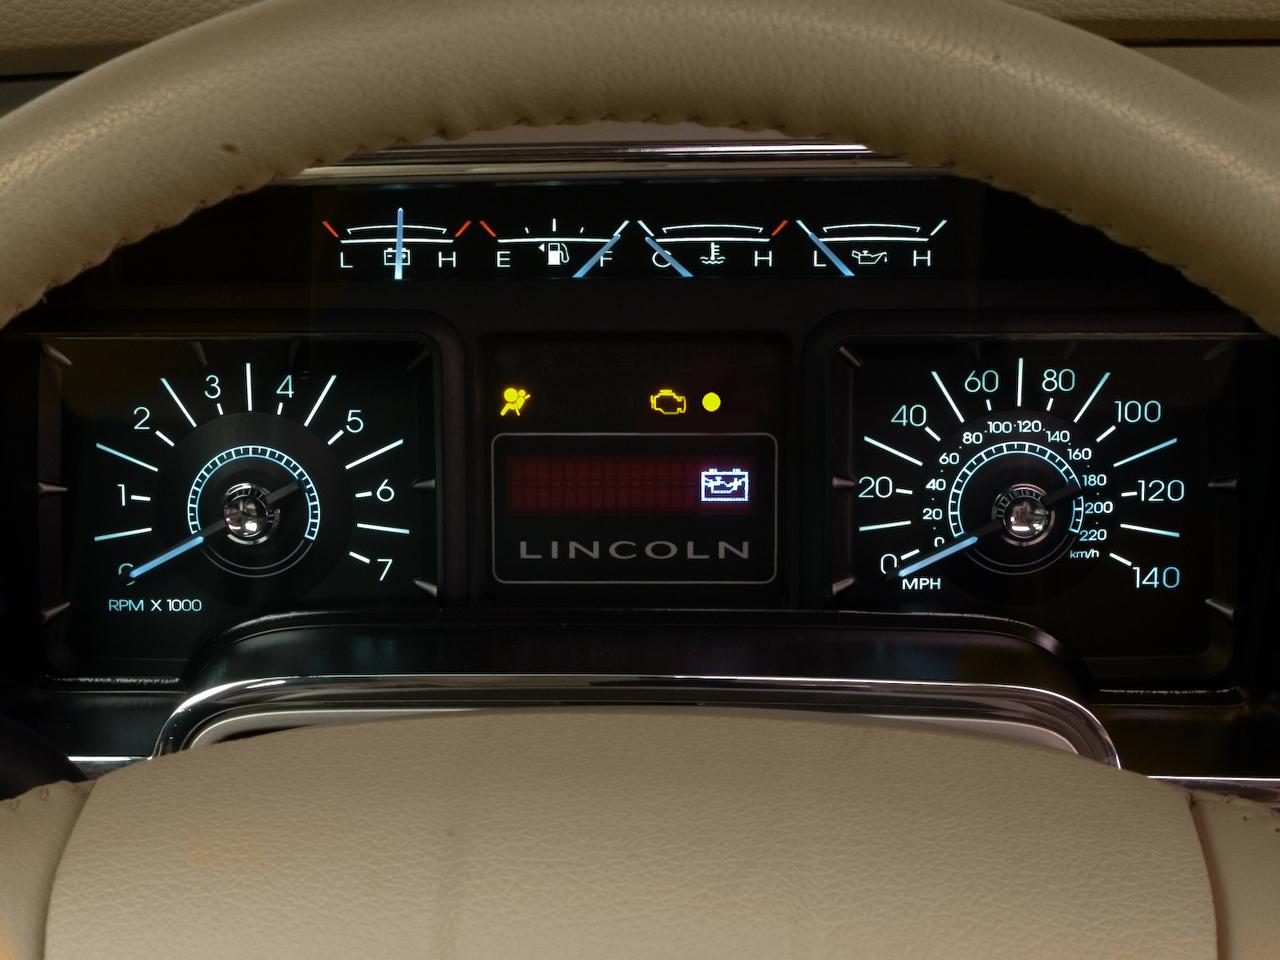 Lincoln Navigator Wd Ultimate Suv Instrument Cluster on 2007 Lincoln Navigator